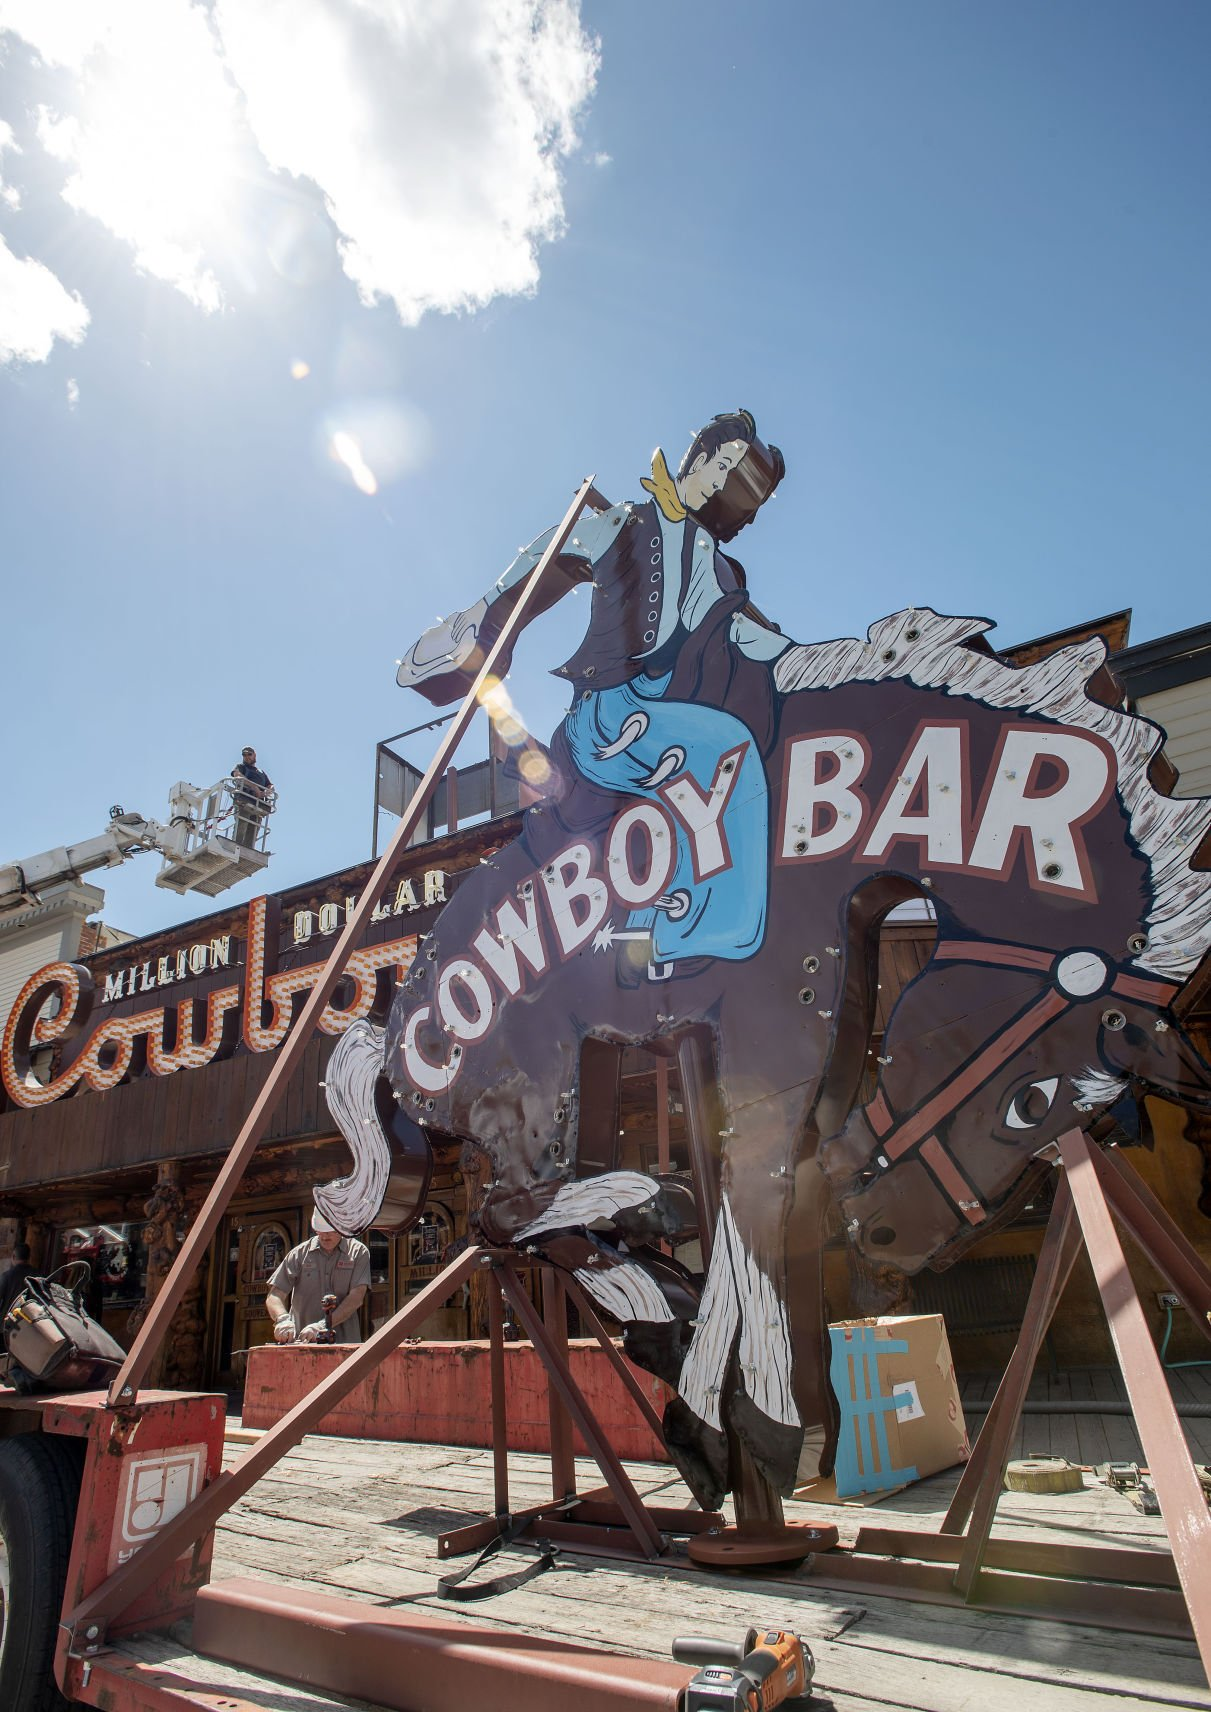 New era same Cowboy Bar New era